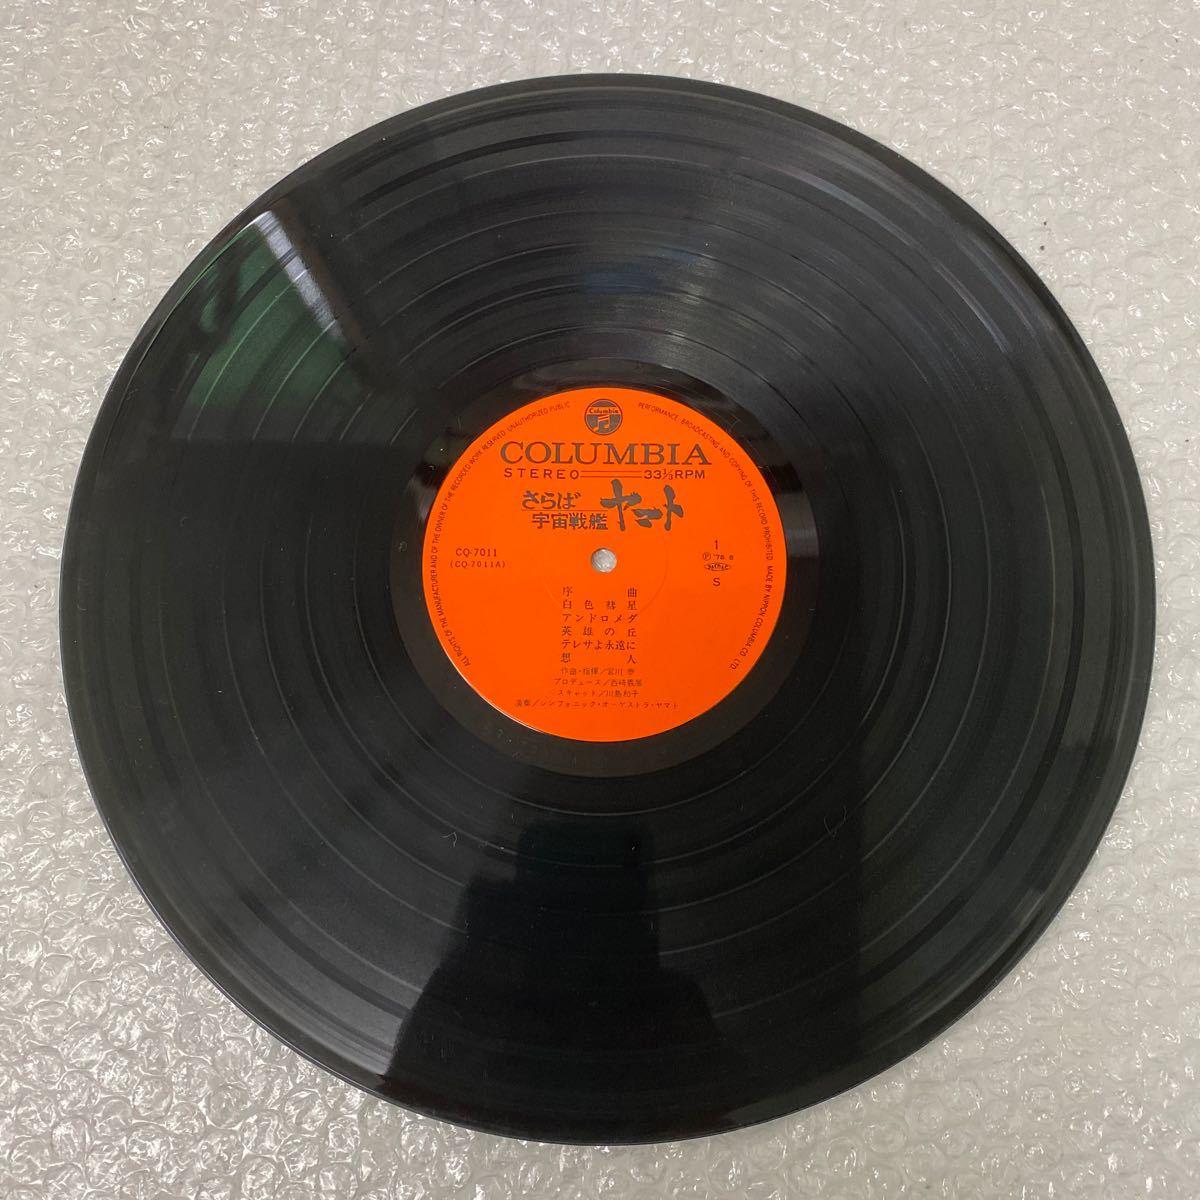 【LP】さらば宇宙戦艦ヤマト 愛の戦士たち 映画音楽集/オリジナルサウンドトラック(CQ-7011)日本コロムビア_画像6